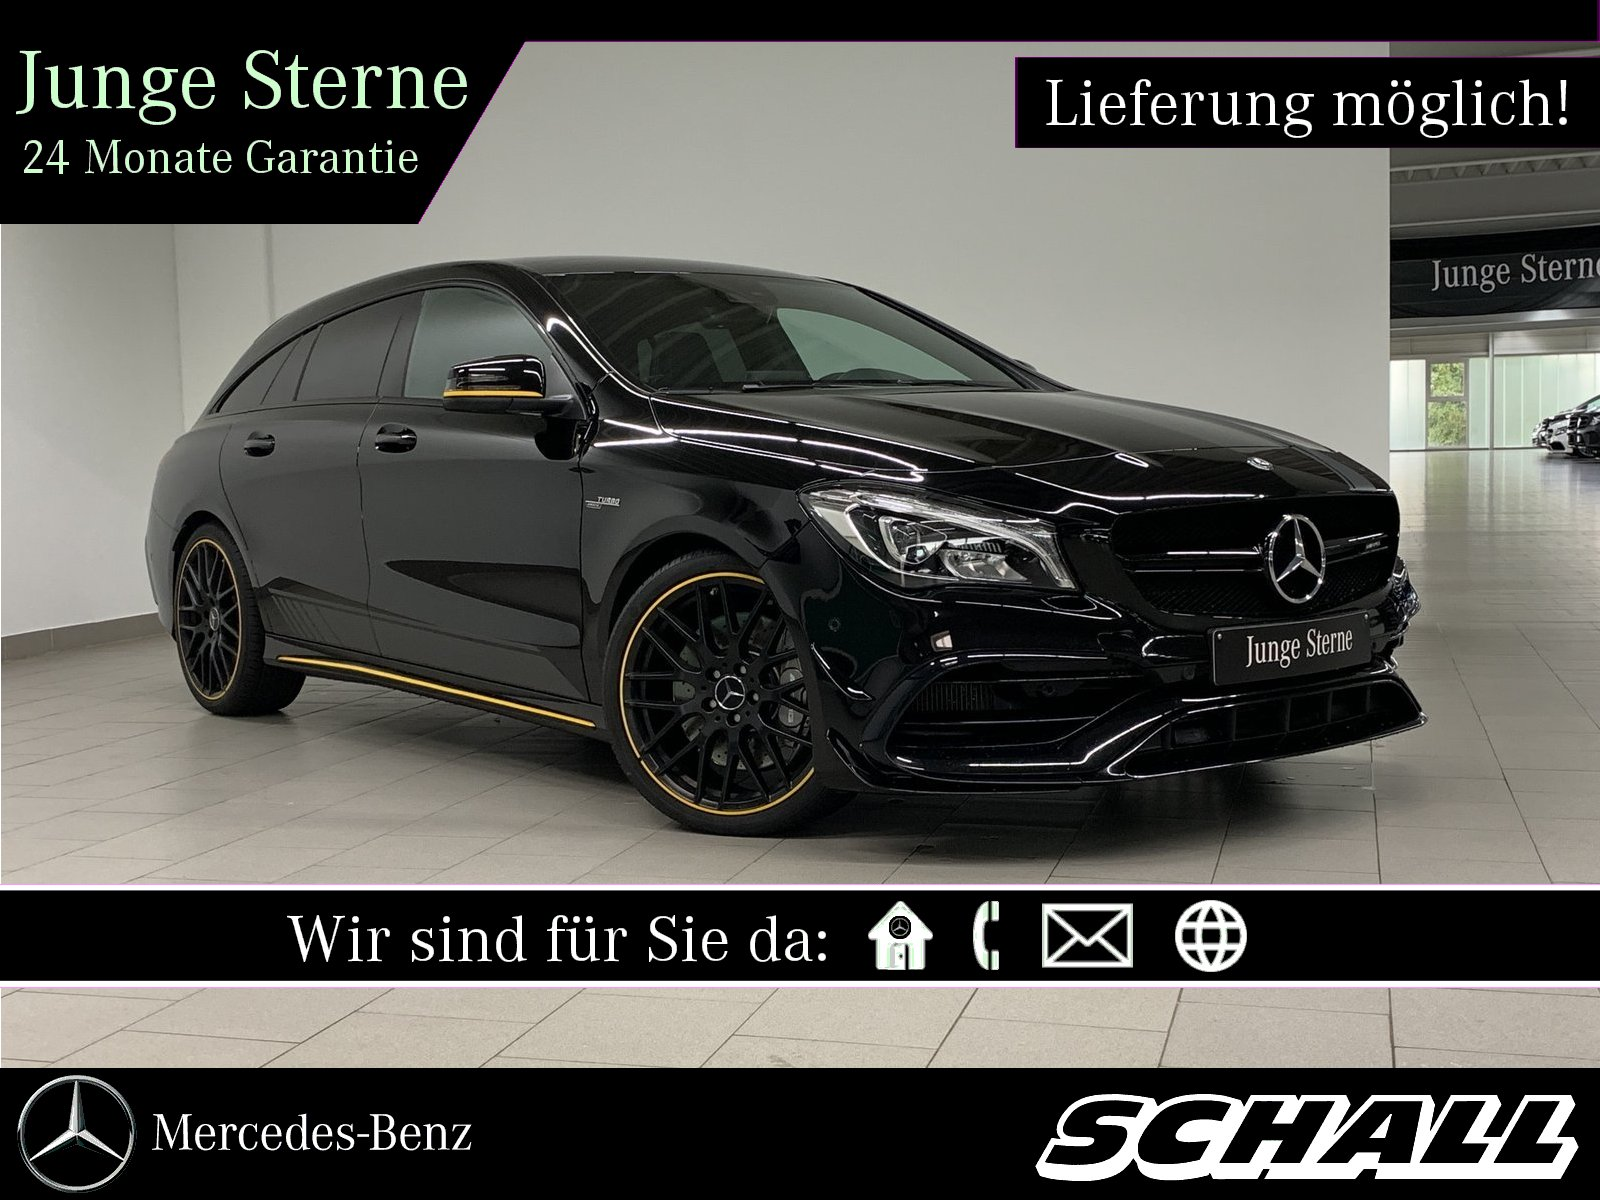 Mercedes-Benz CLA 45 AMG 4M SB PERF.SITZE+PERF.ABGAS+AERODYNAM, Jahr 2017, Benzin